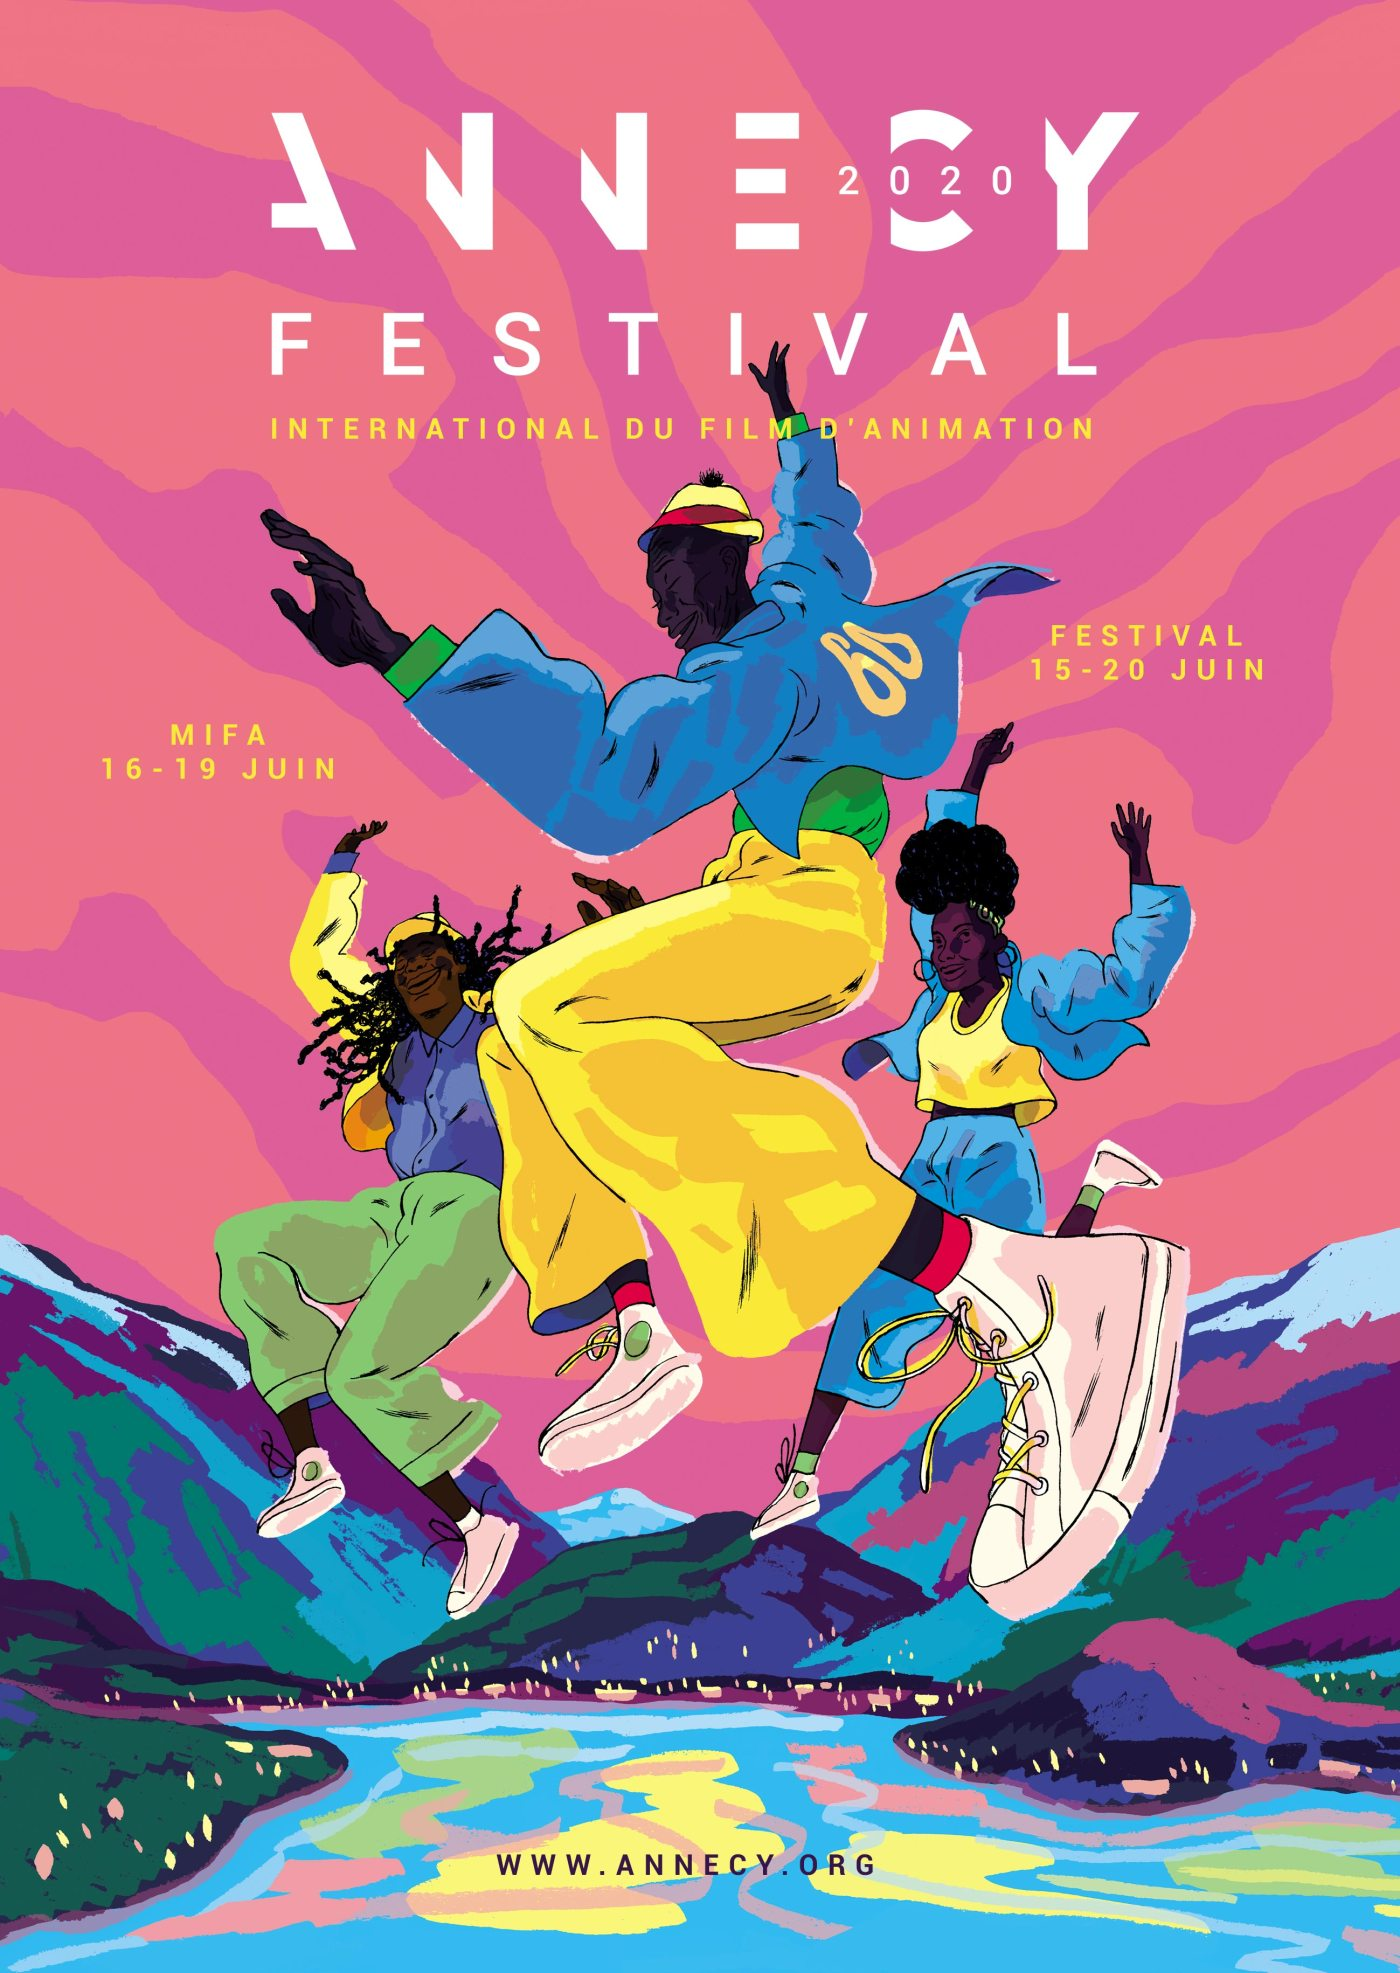 Le Festival international du film d'animation